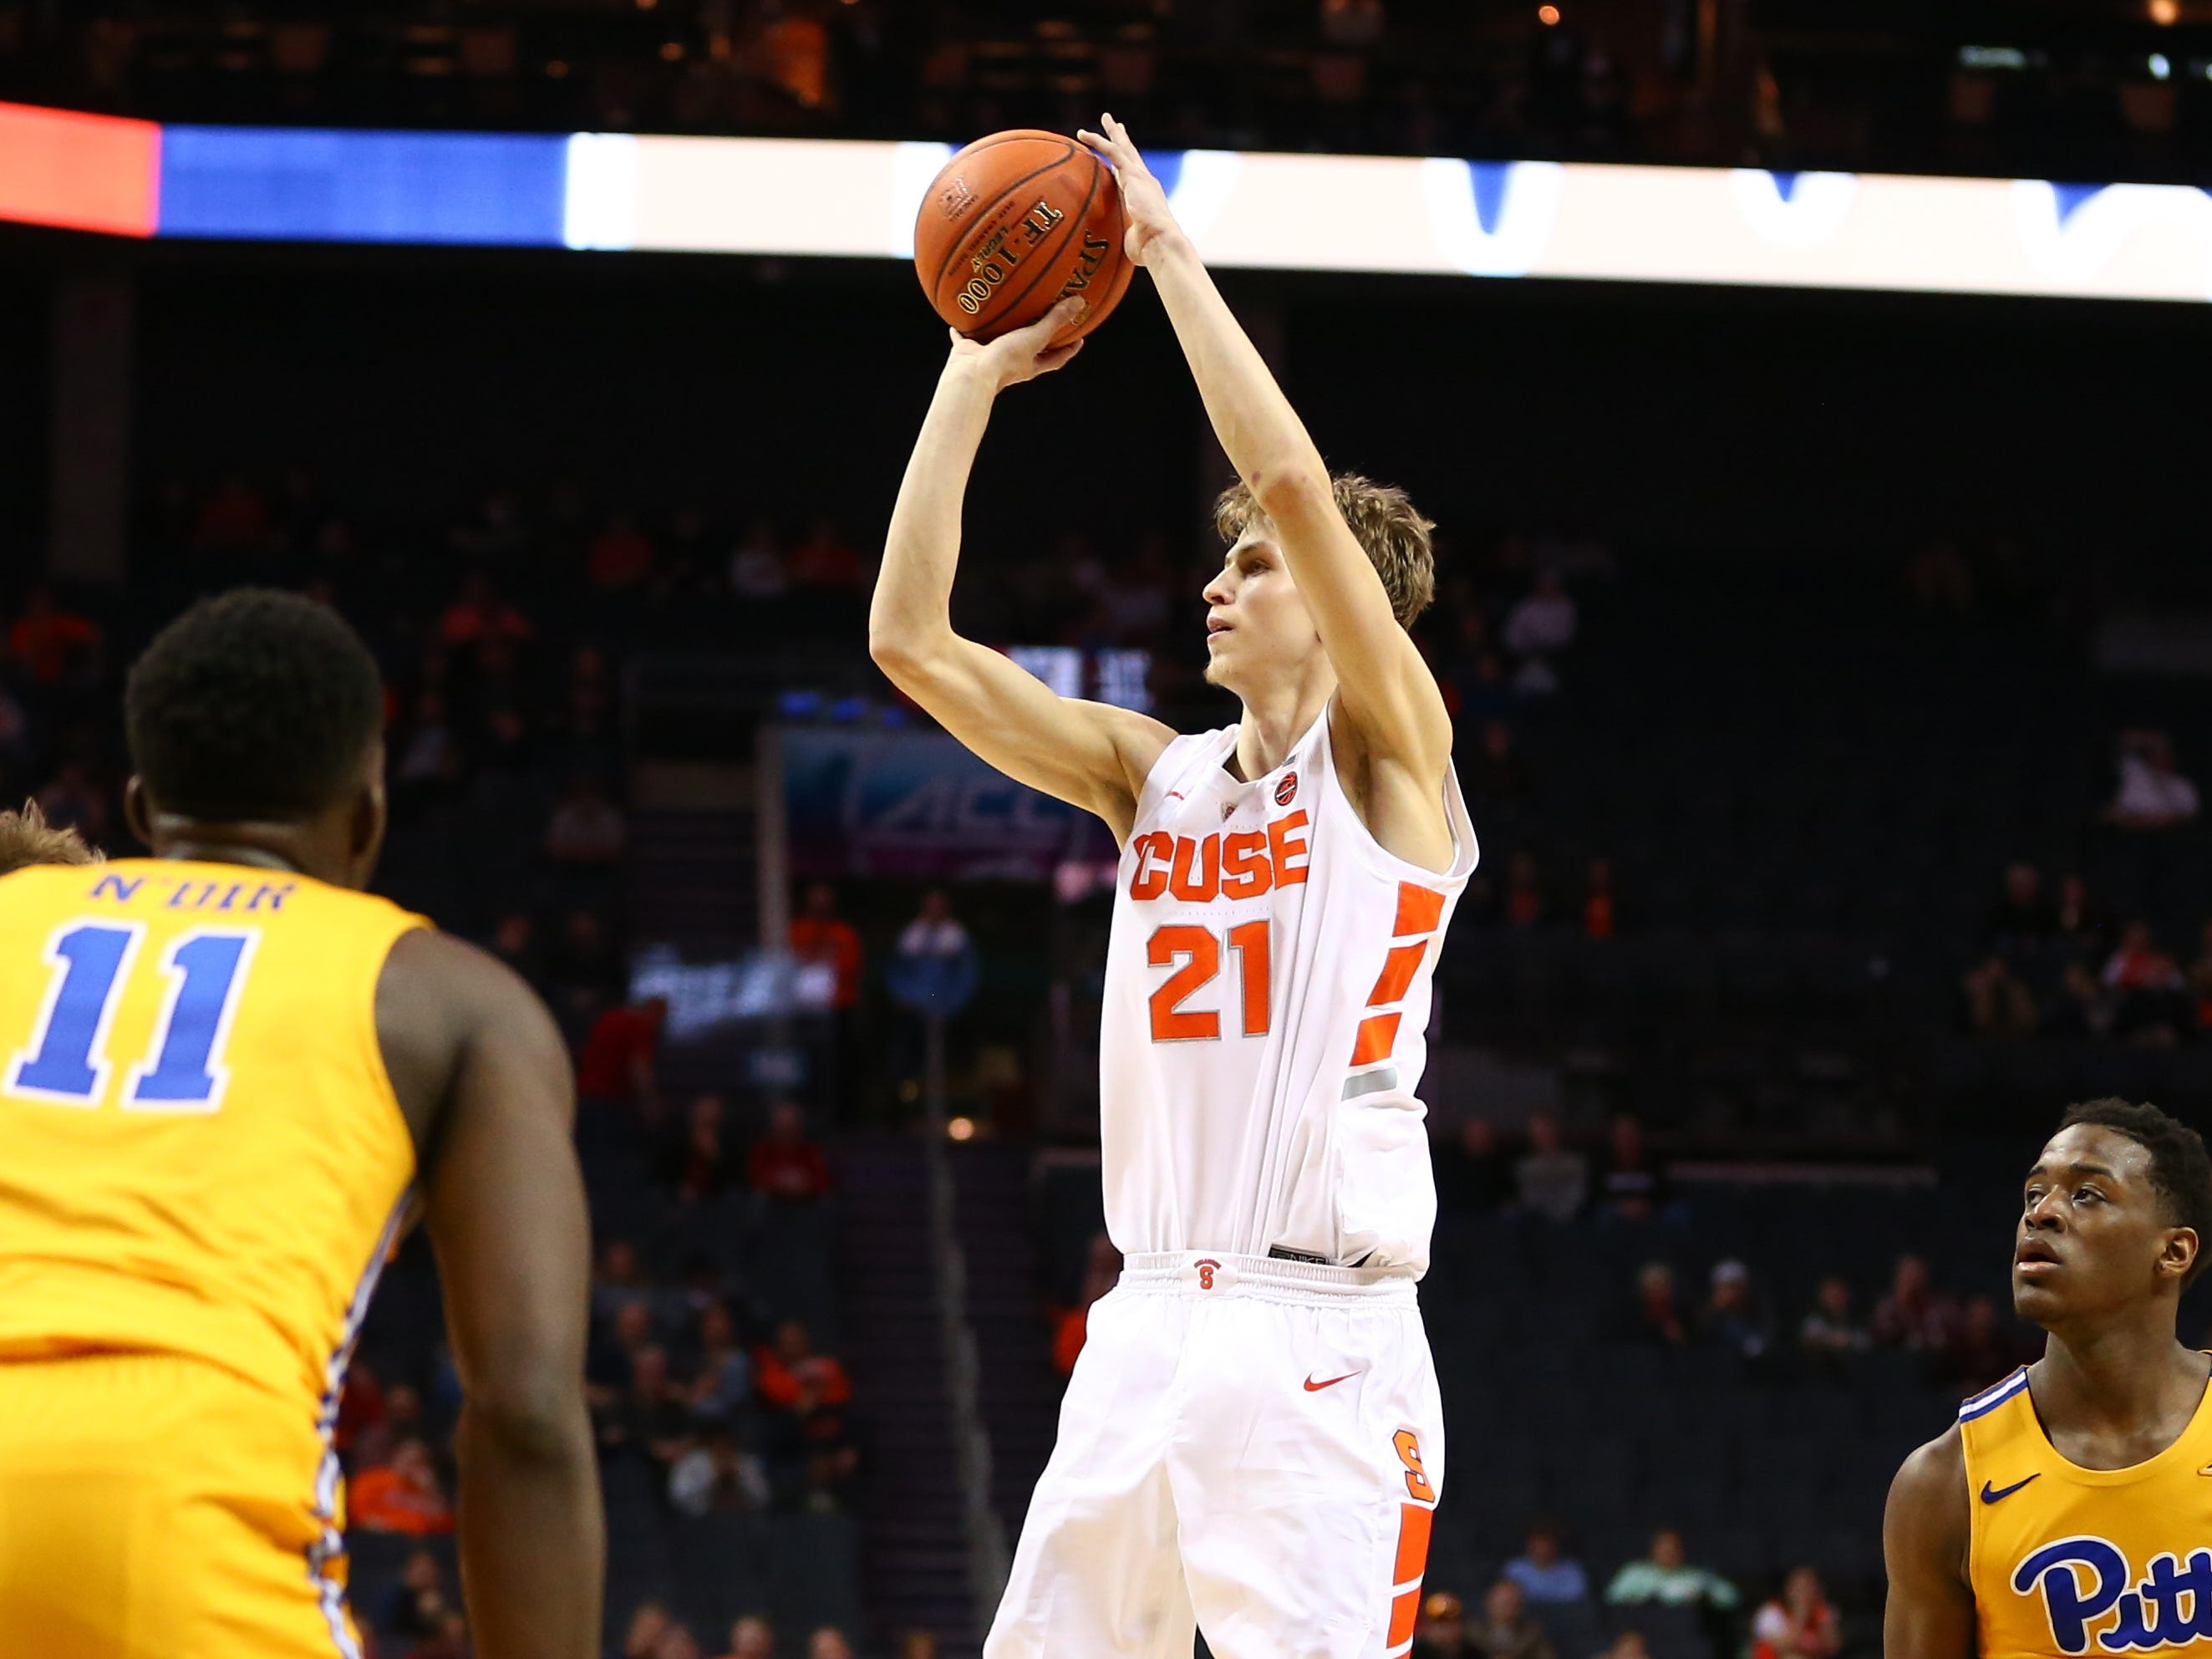 Syracuse forward Marek Dolezaj (21) shoots the ball against Pittsburgh.